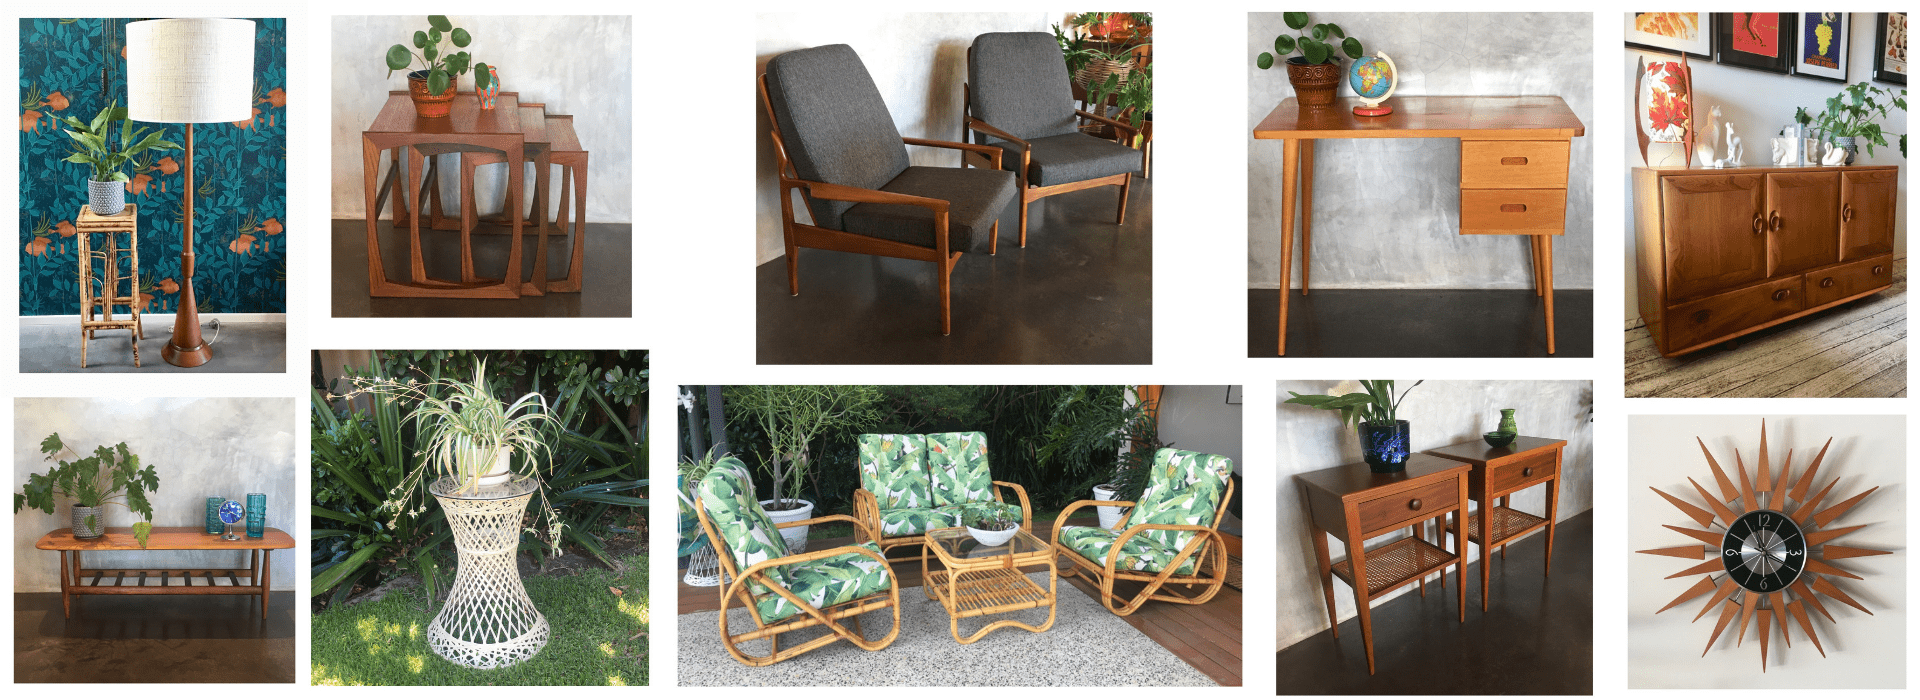 Mid Century Furniture Perth | 20th Century Vintage